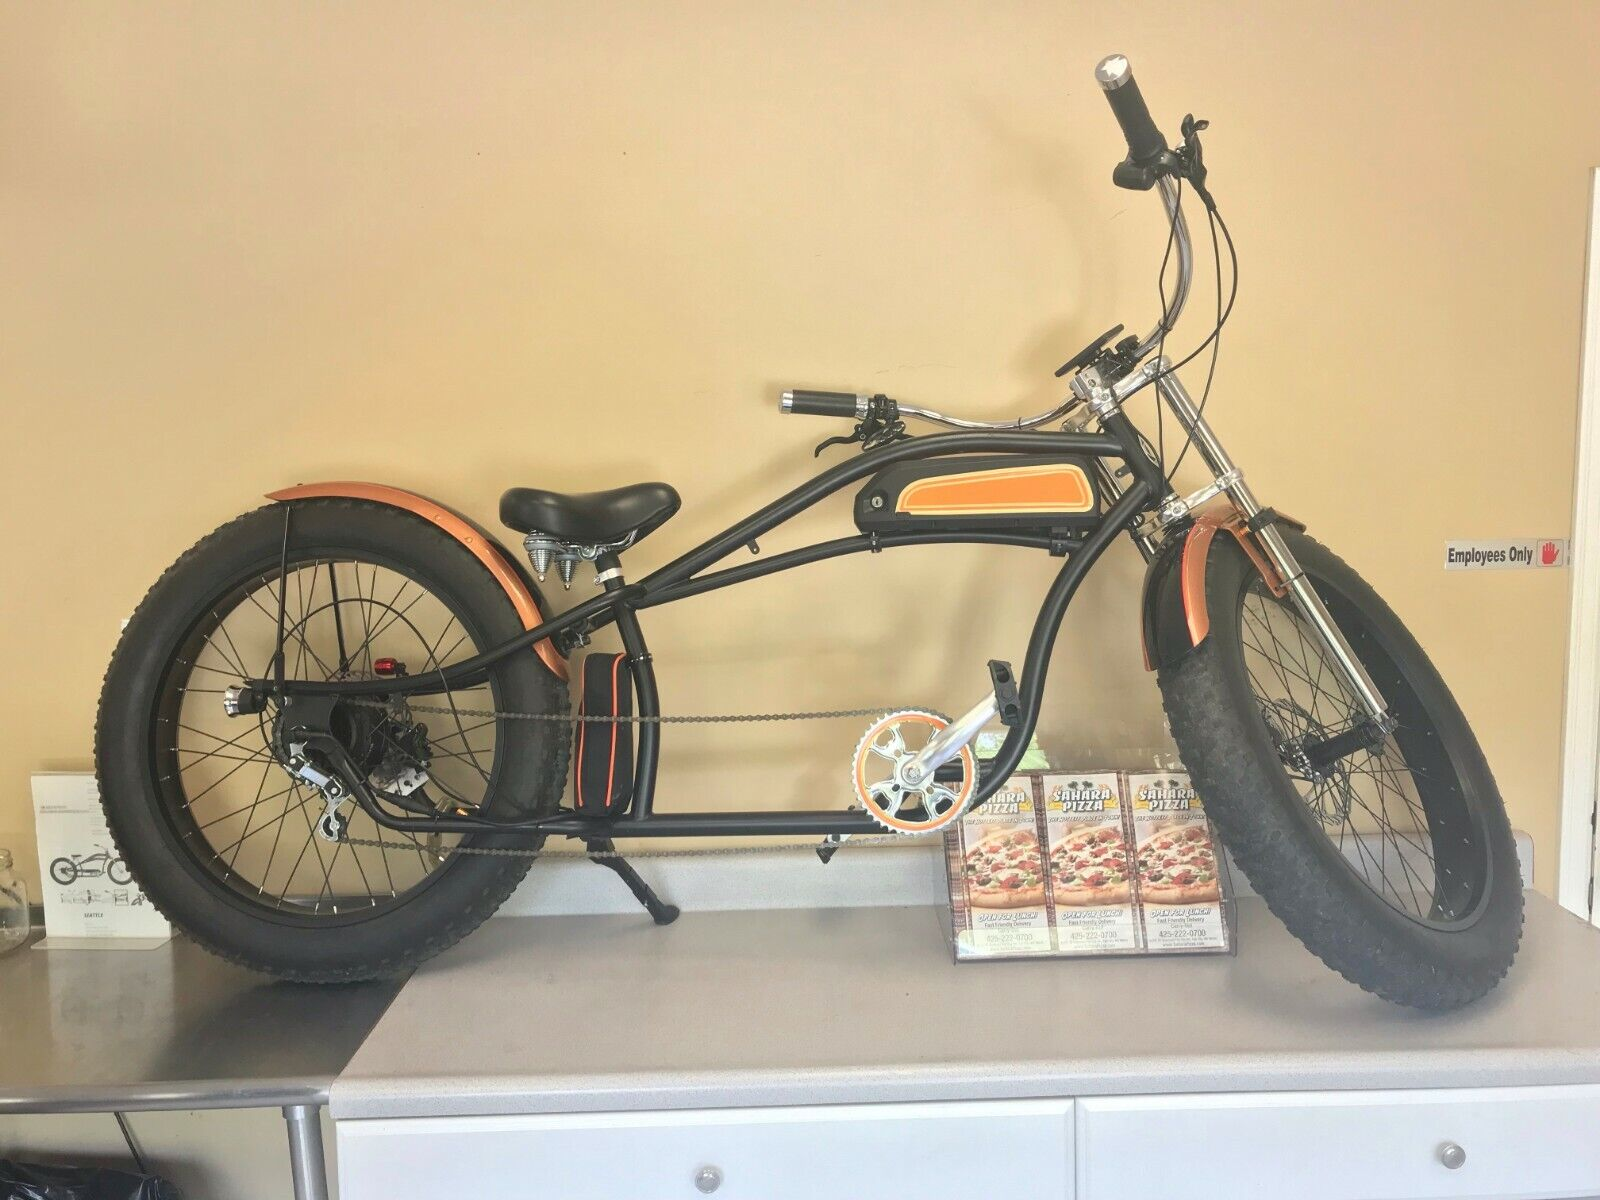 69149fa9875 Find Micargi BMX Bikes for sale